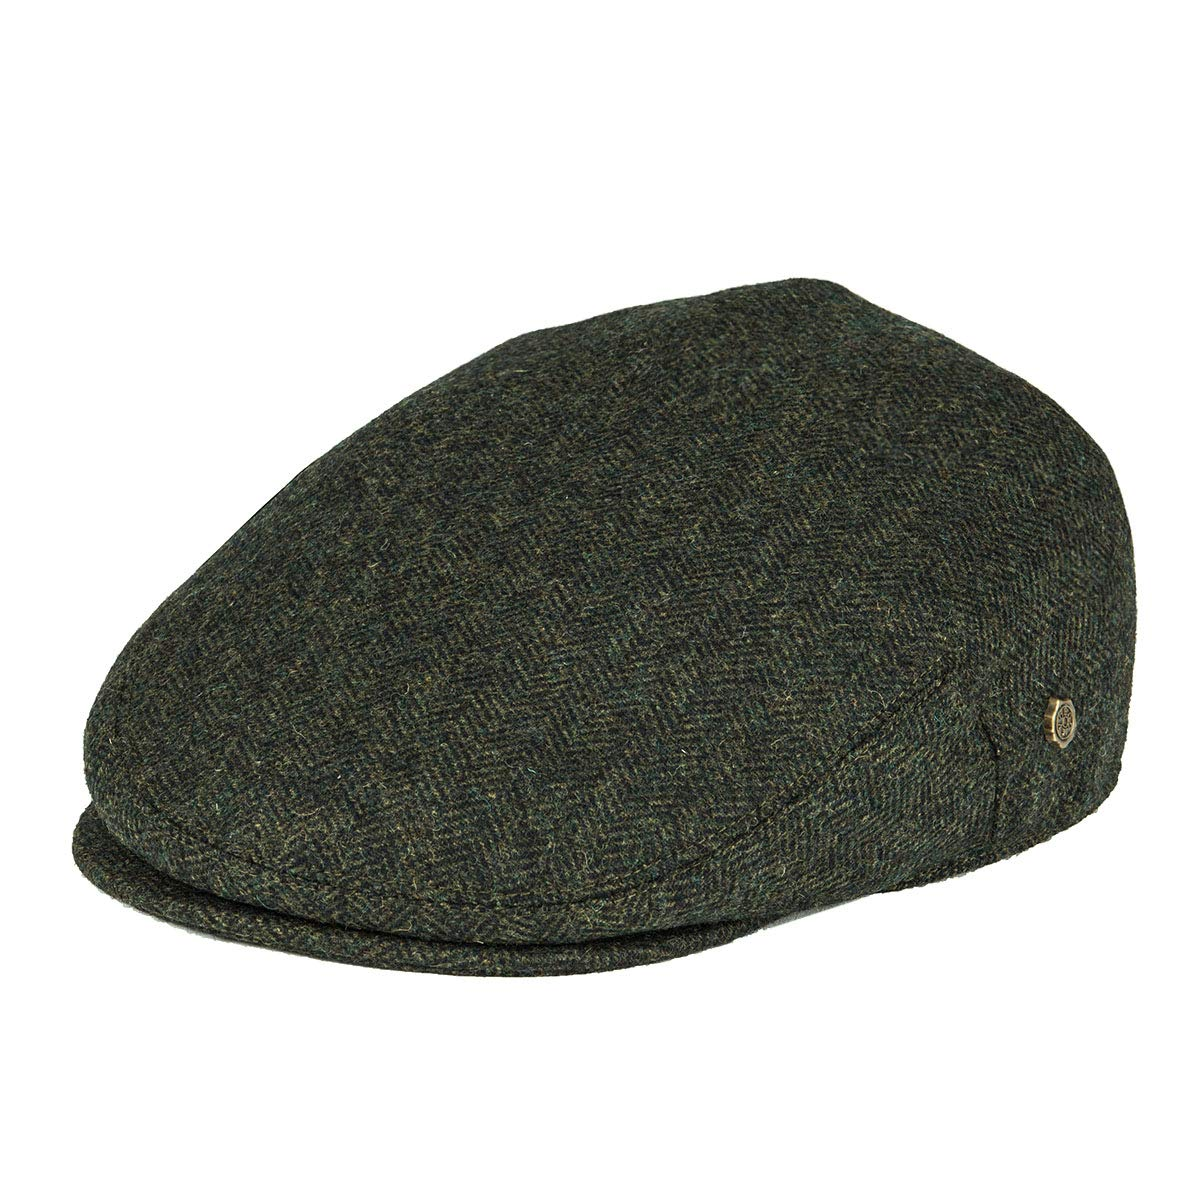 e38ed684f4f VOBOOM Men s Herringbone Flat Ivy Newsboy Hat Wool Blend Gatsby Cabbie Cap  at Amazon Men s Clothing store